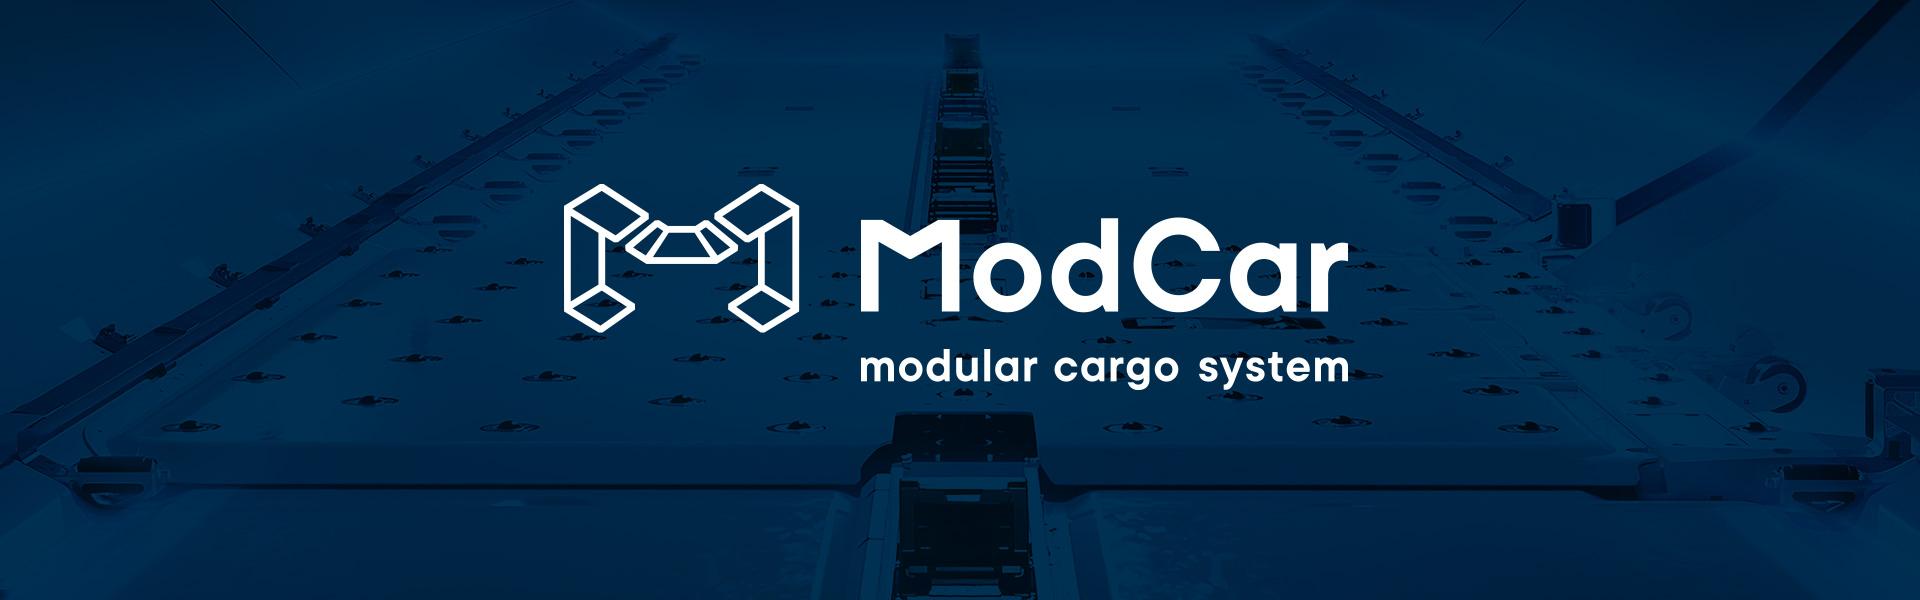 ModCar / Signet